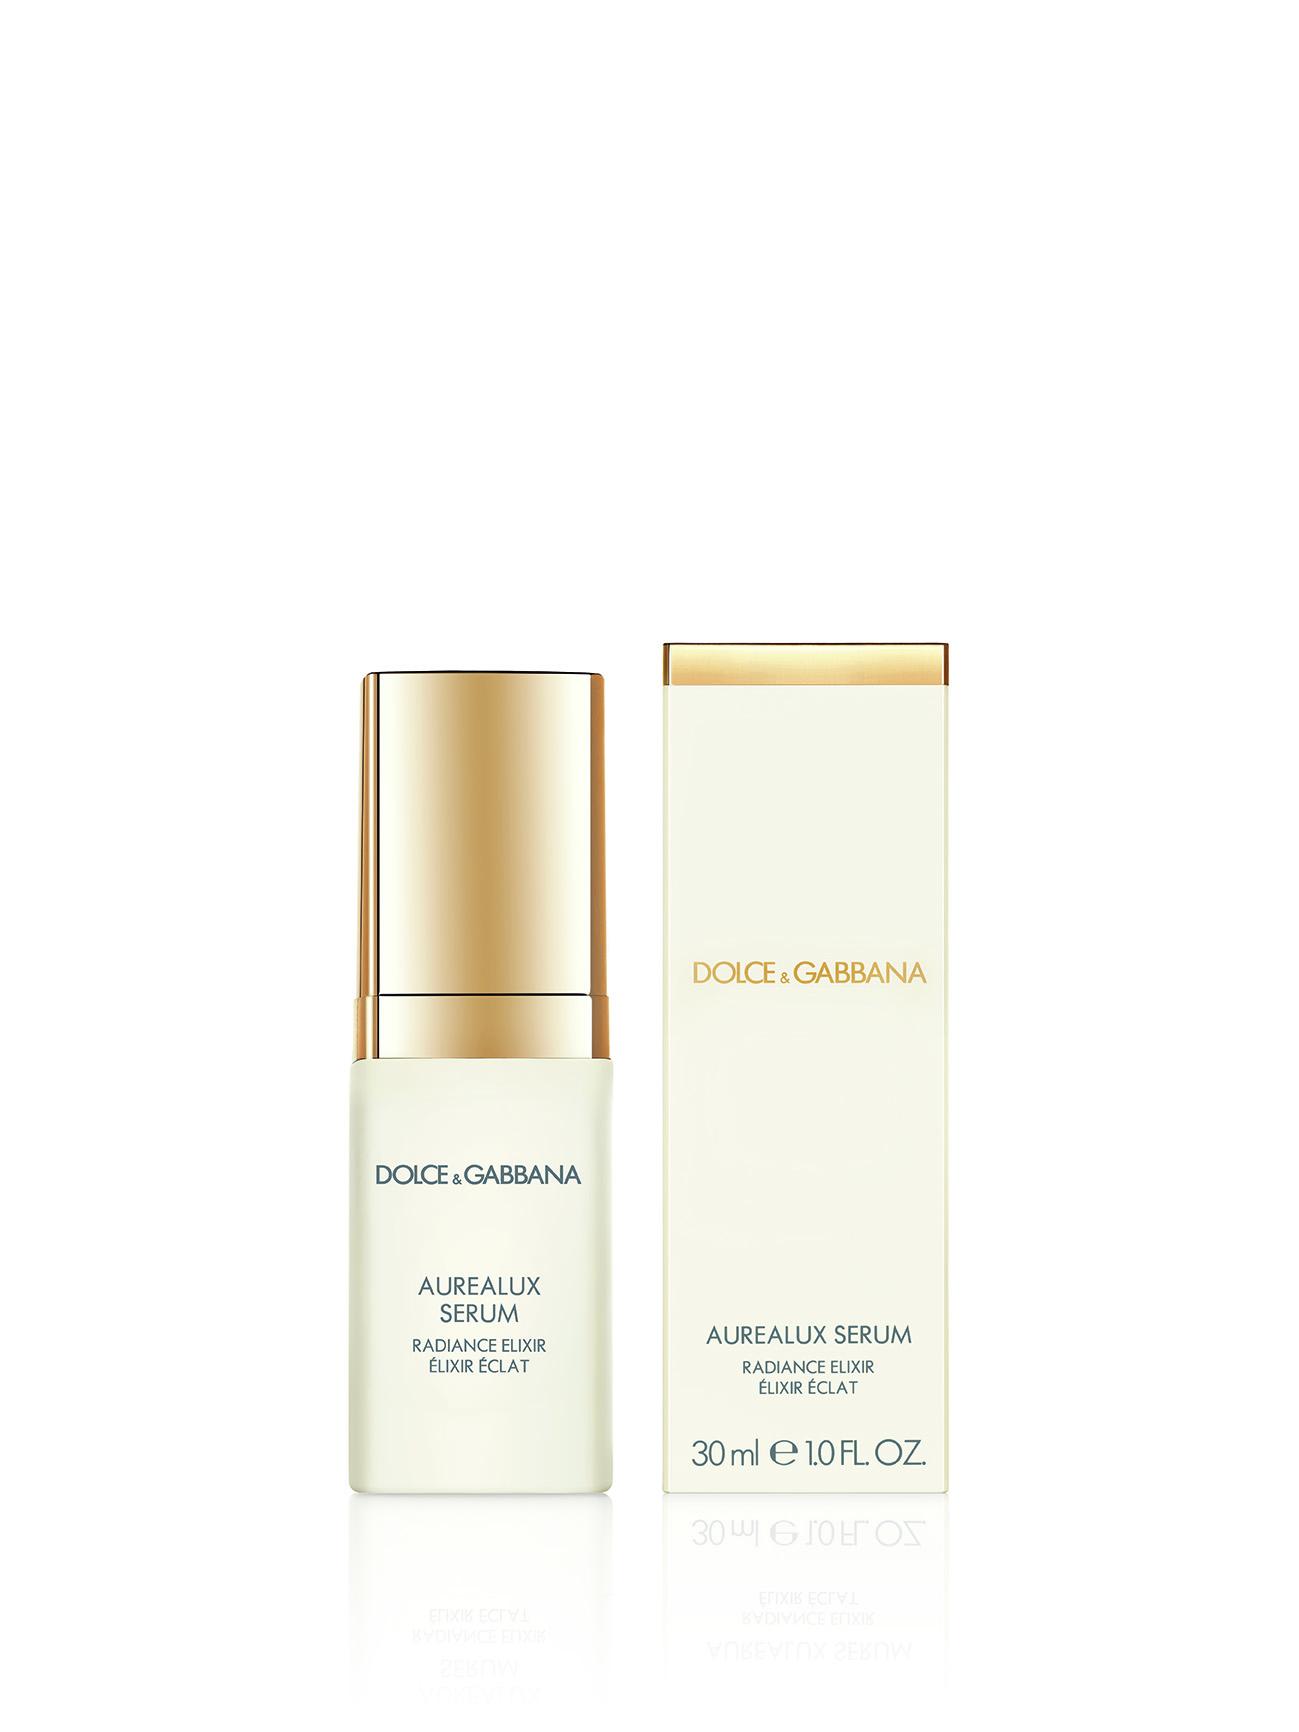 Dolce & Gabbana Skincare Aurealux Serum (30 ml, PVPR 98,50 €)